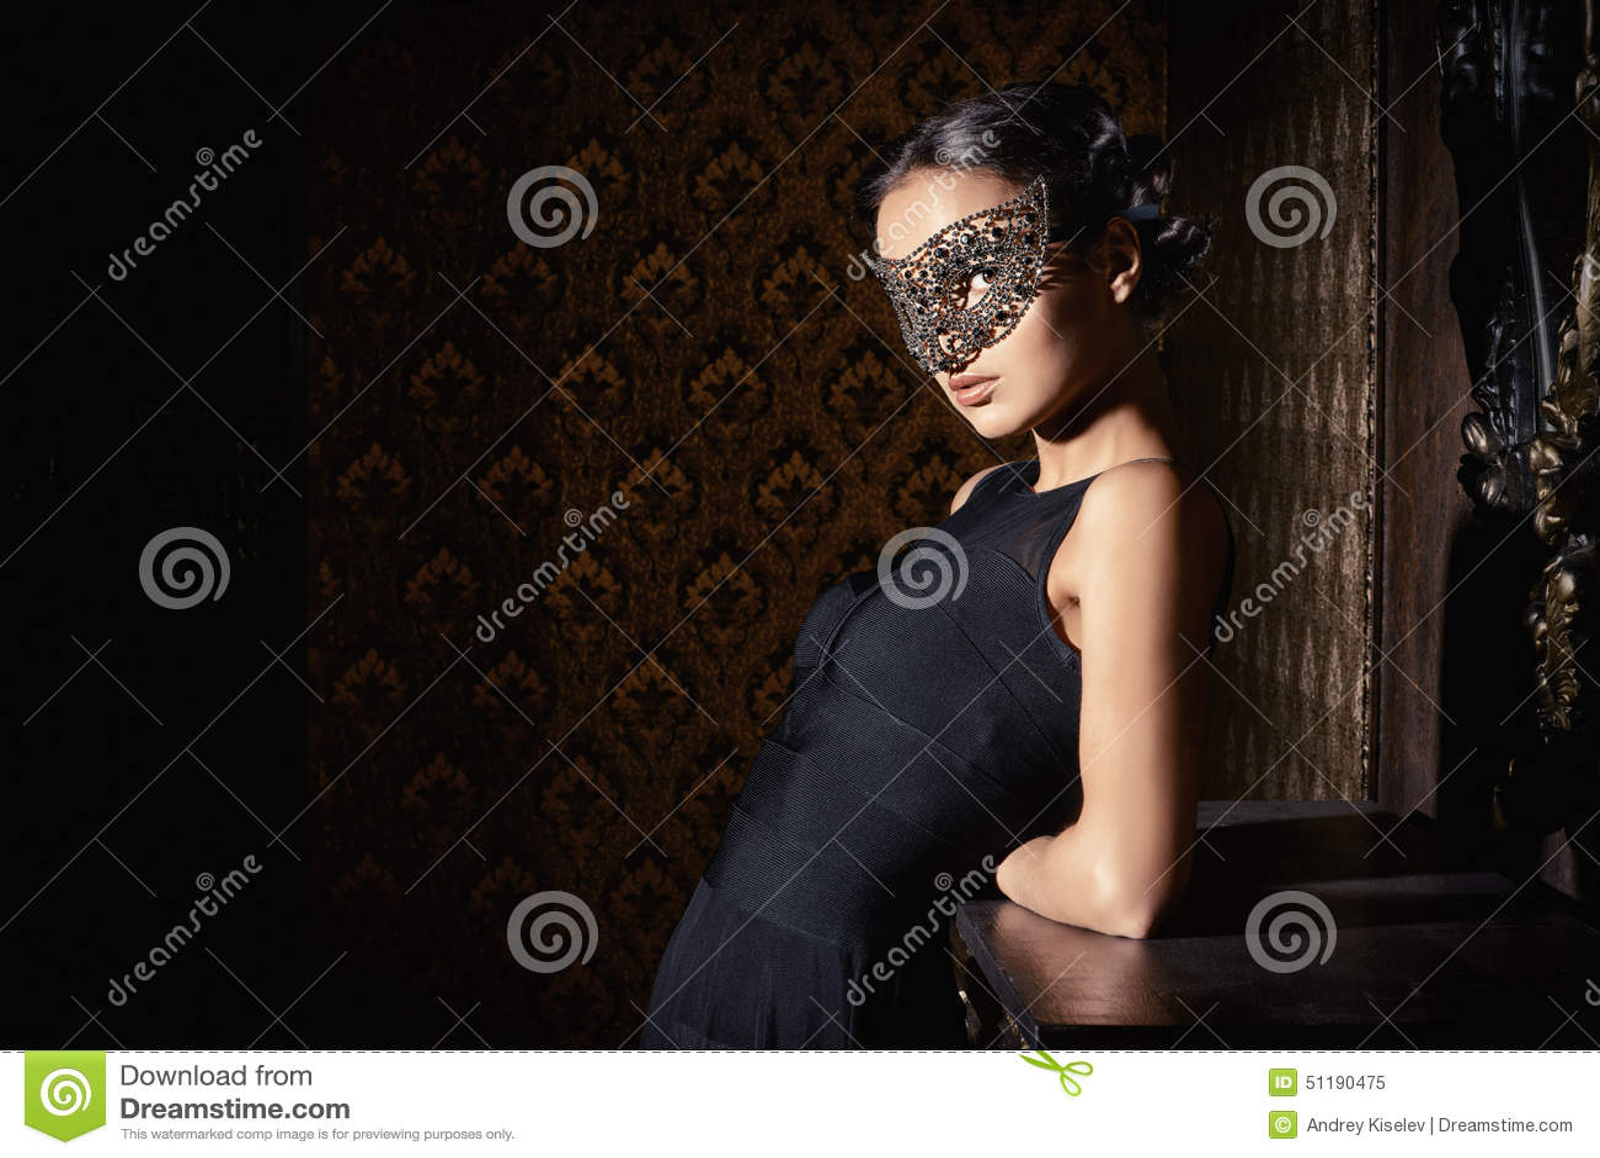 A masked stranger made me cum mutliple times nina rivera 8